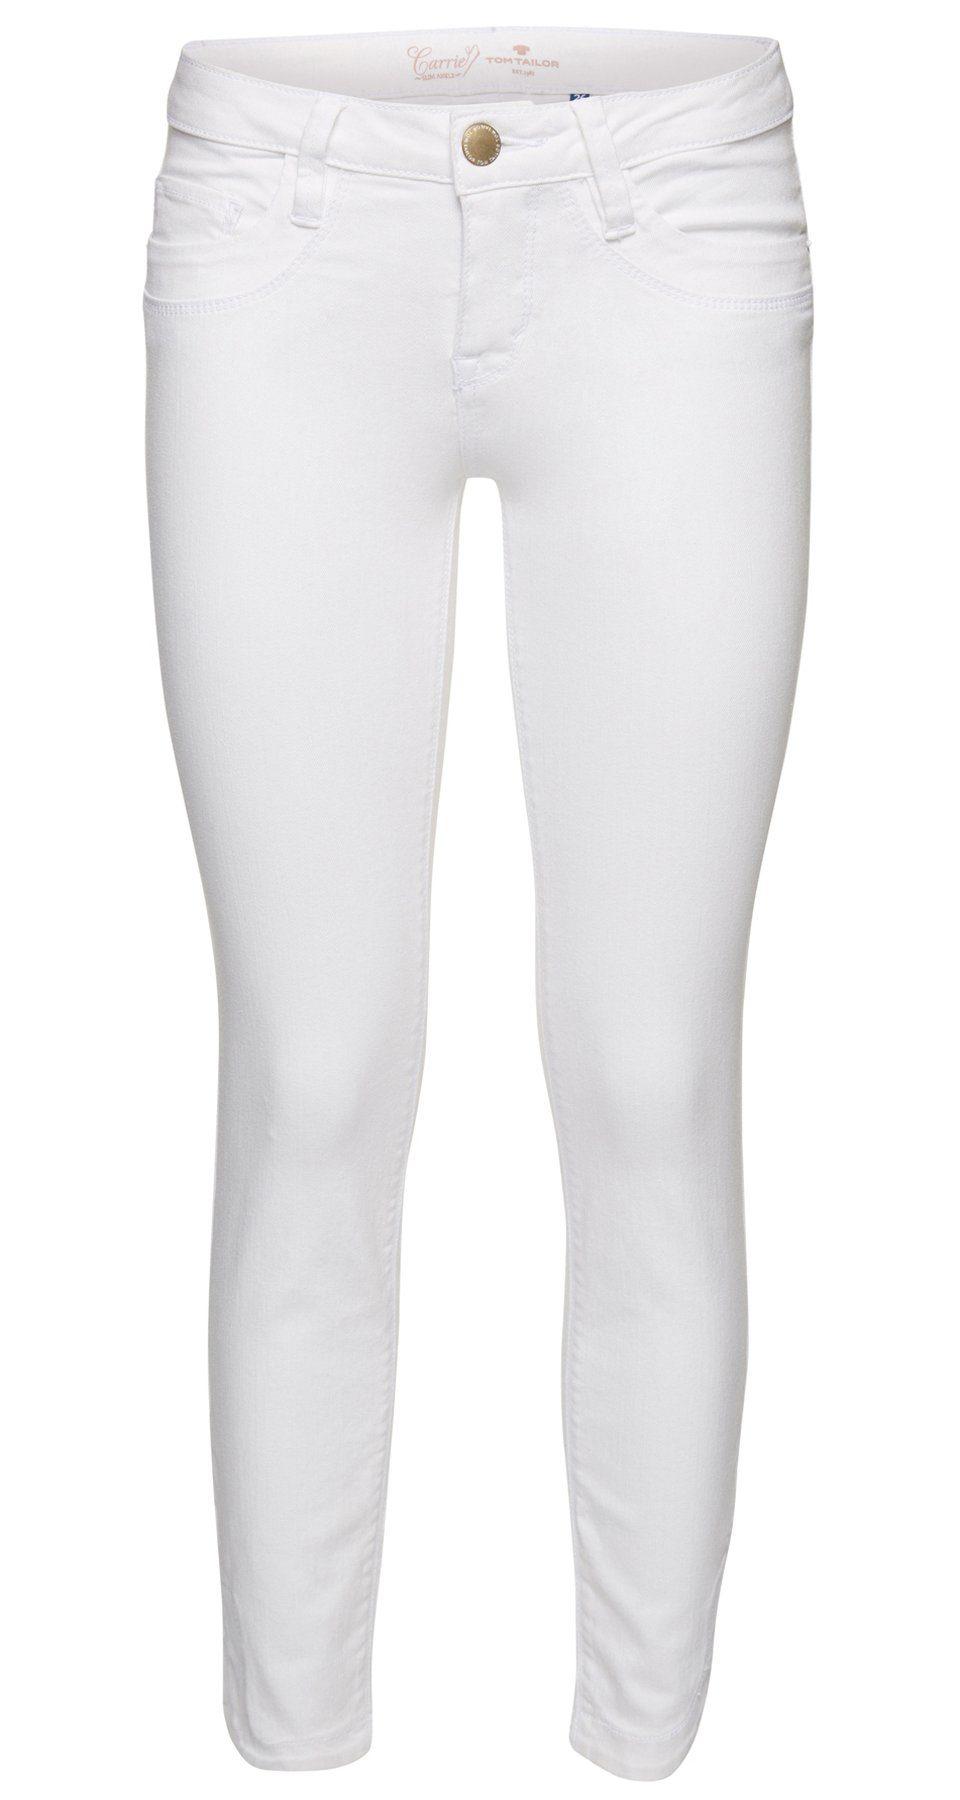 TOM TAILOR Jeans »Slim-Fit-Hose in Ankle-Länge«